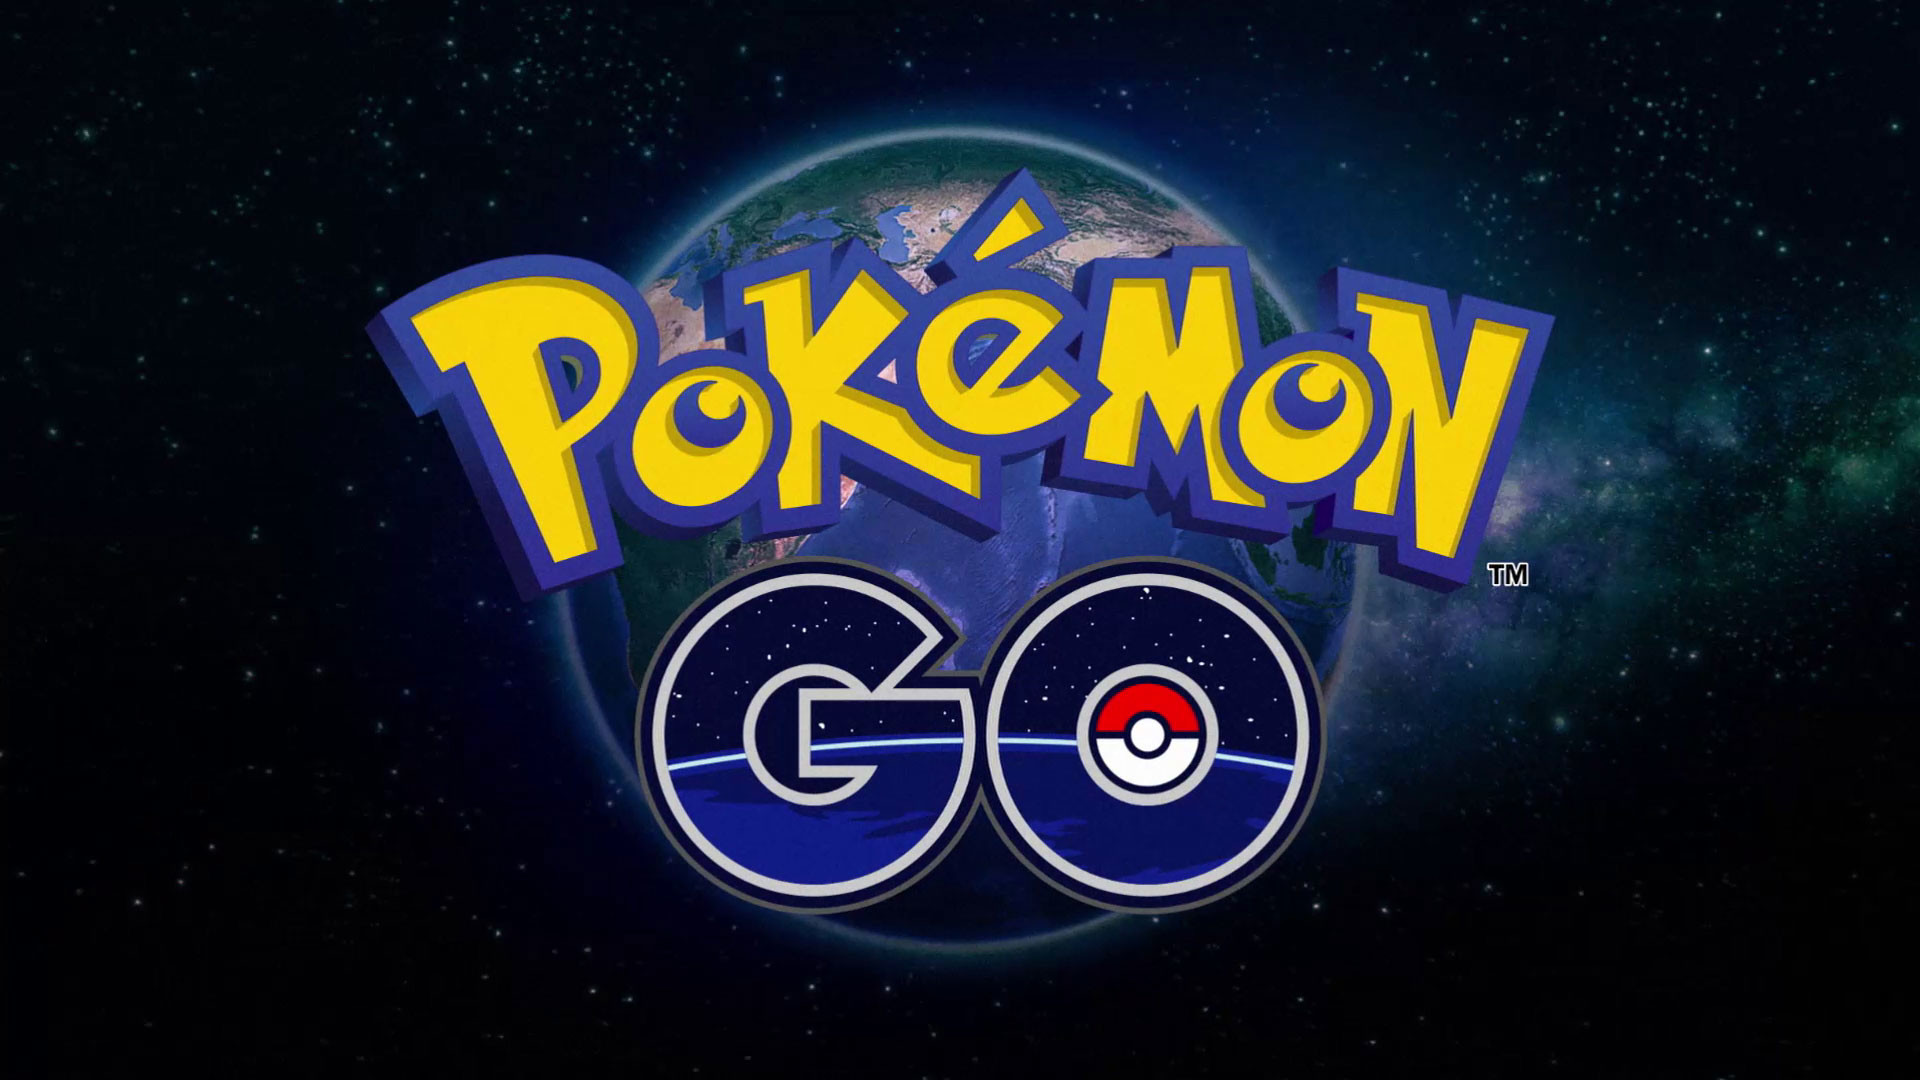 Pokemon GO 4K Wallpaper | Pokemon GO 1080p Wallpaper …